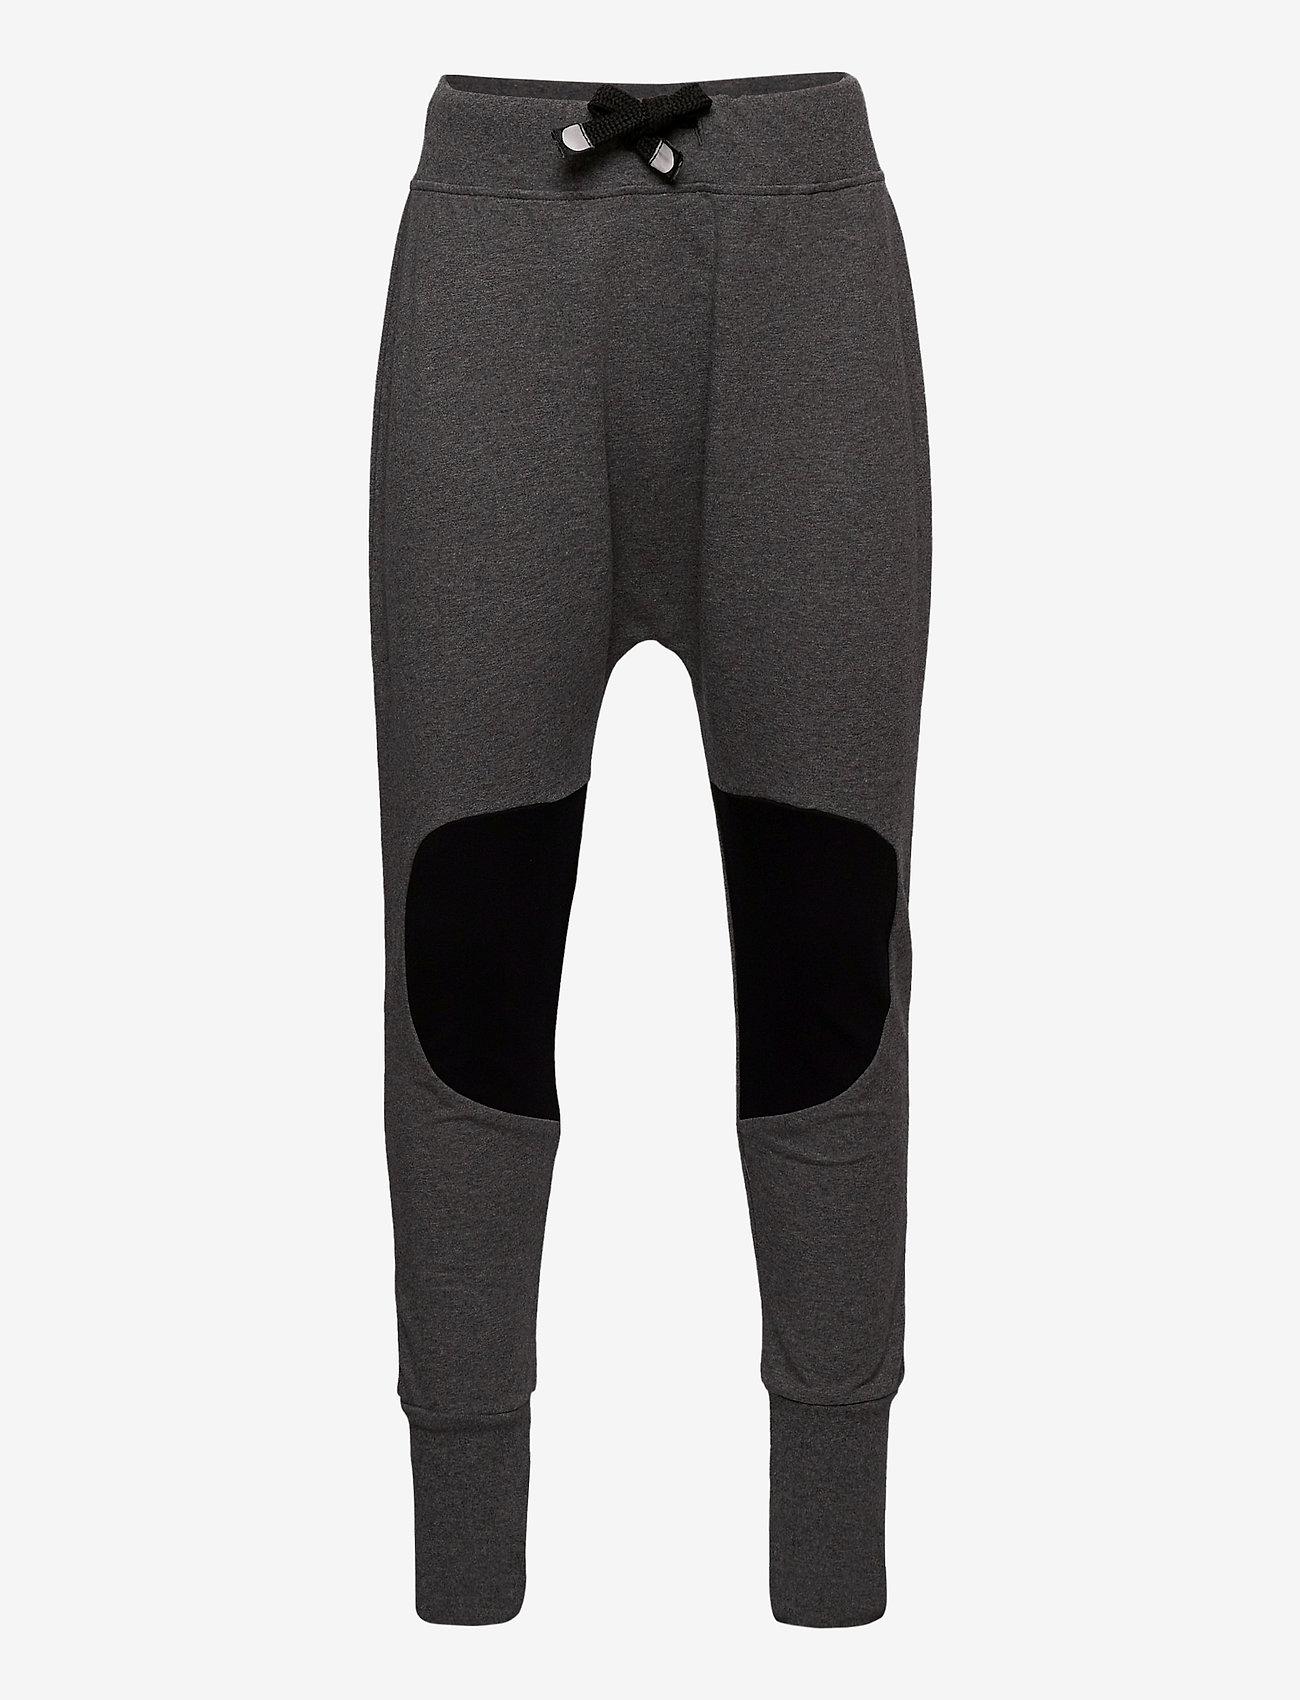 Papu - PATCH BAGGY KID - jogginghosen - melange grey - 0